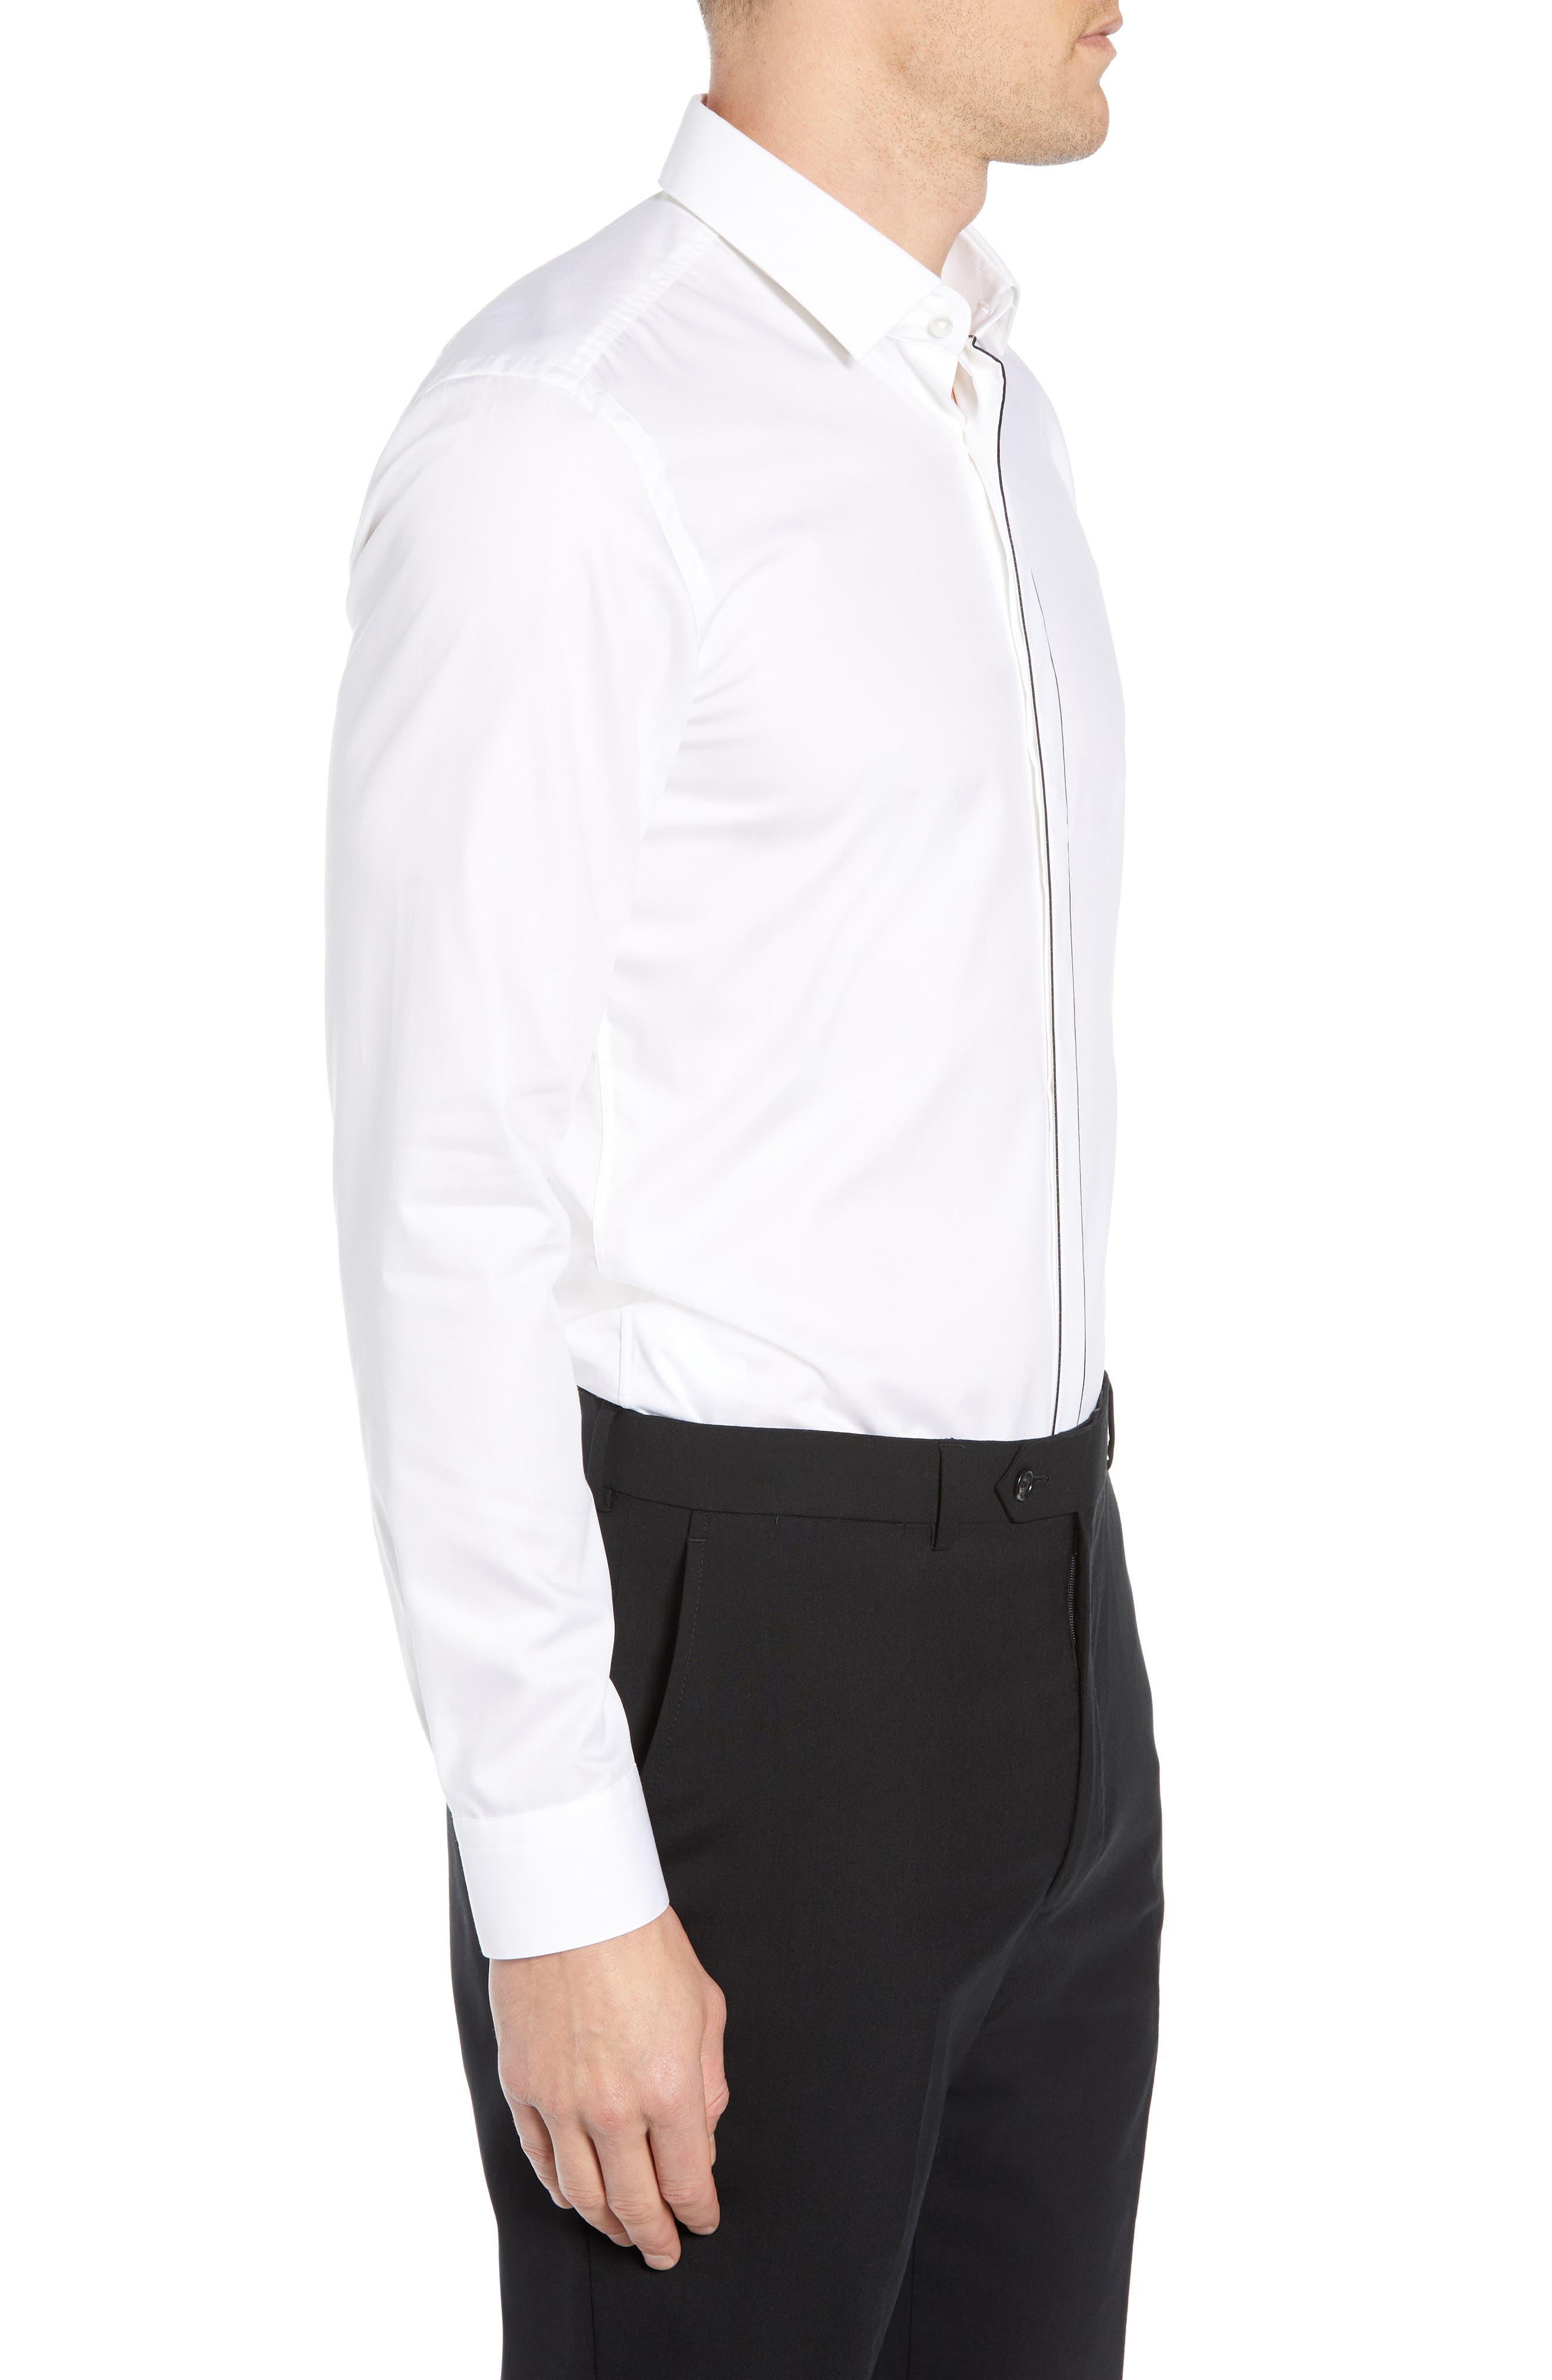 Jamir Slim Fit Easy Iron Solid Dress Shirt,                             Alternate thumbnail 4, color,                             100